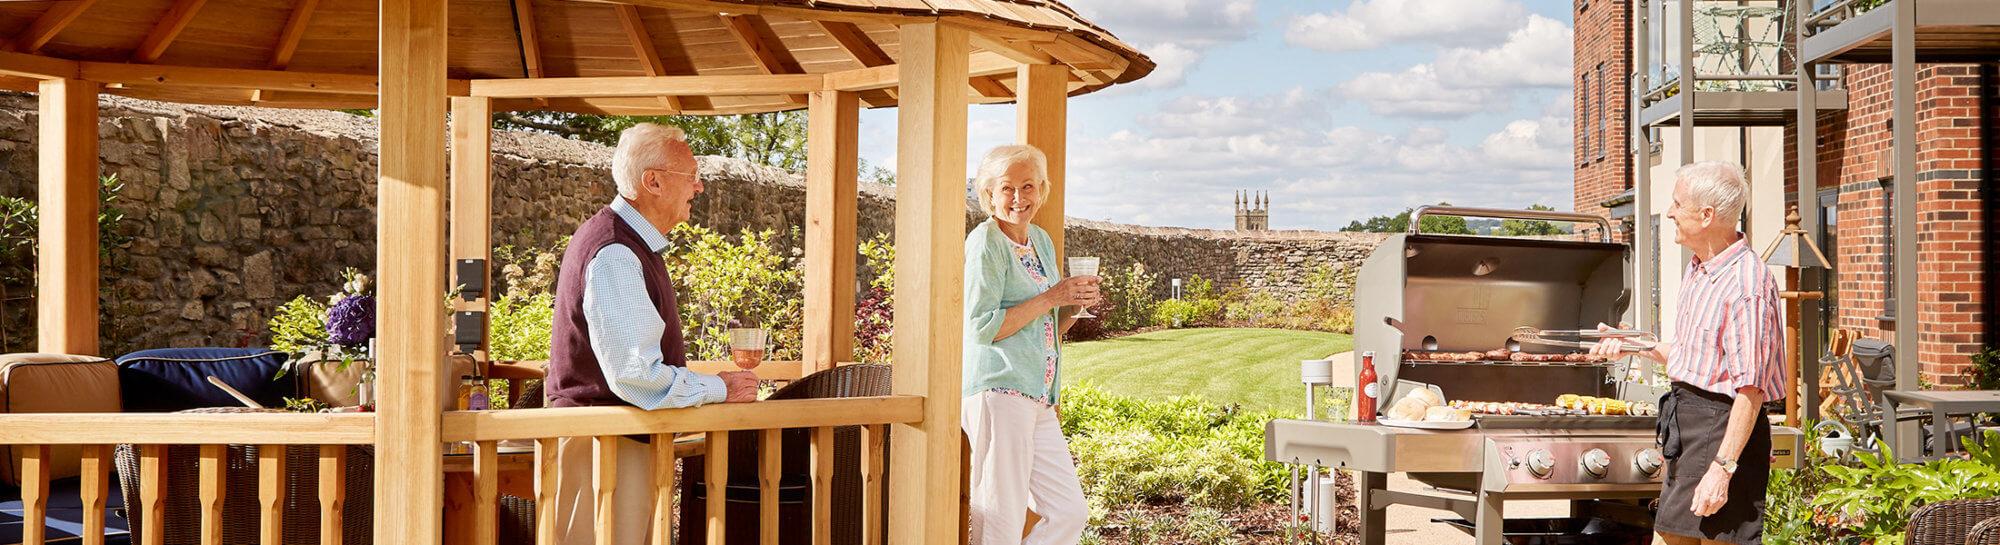 uk-retirement-homes-community